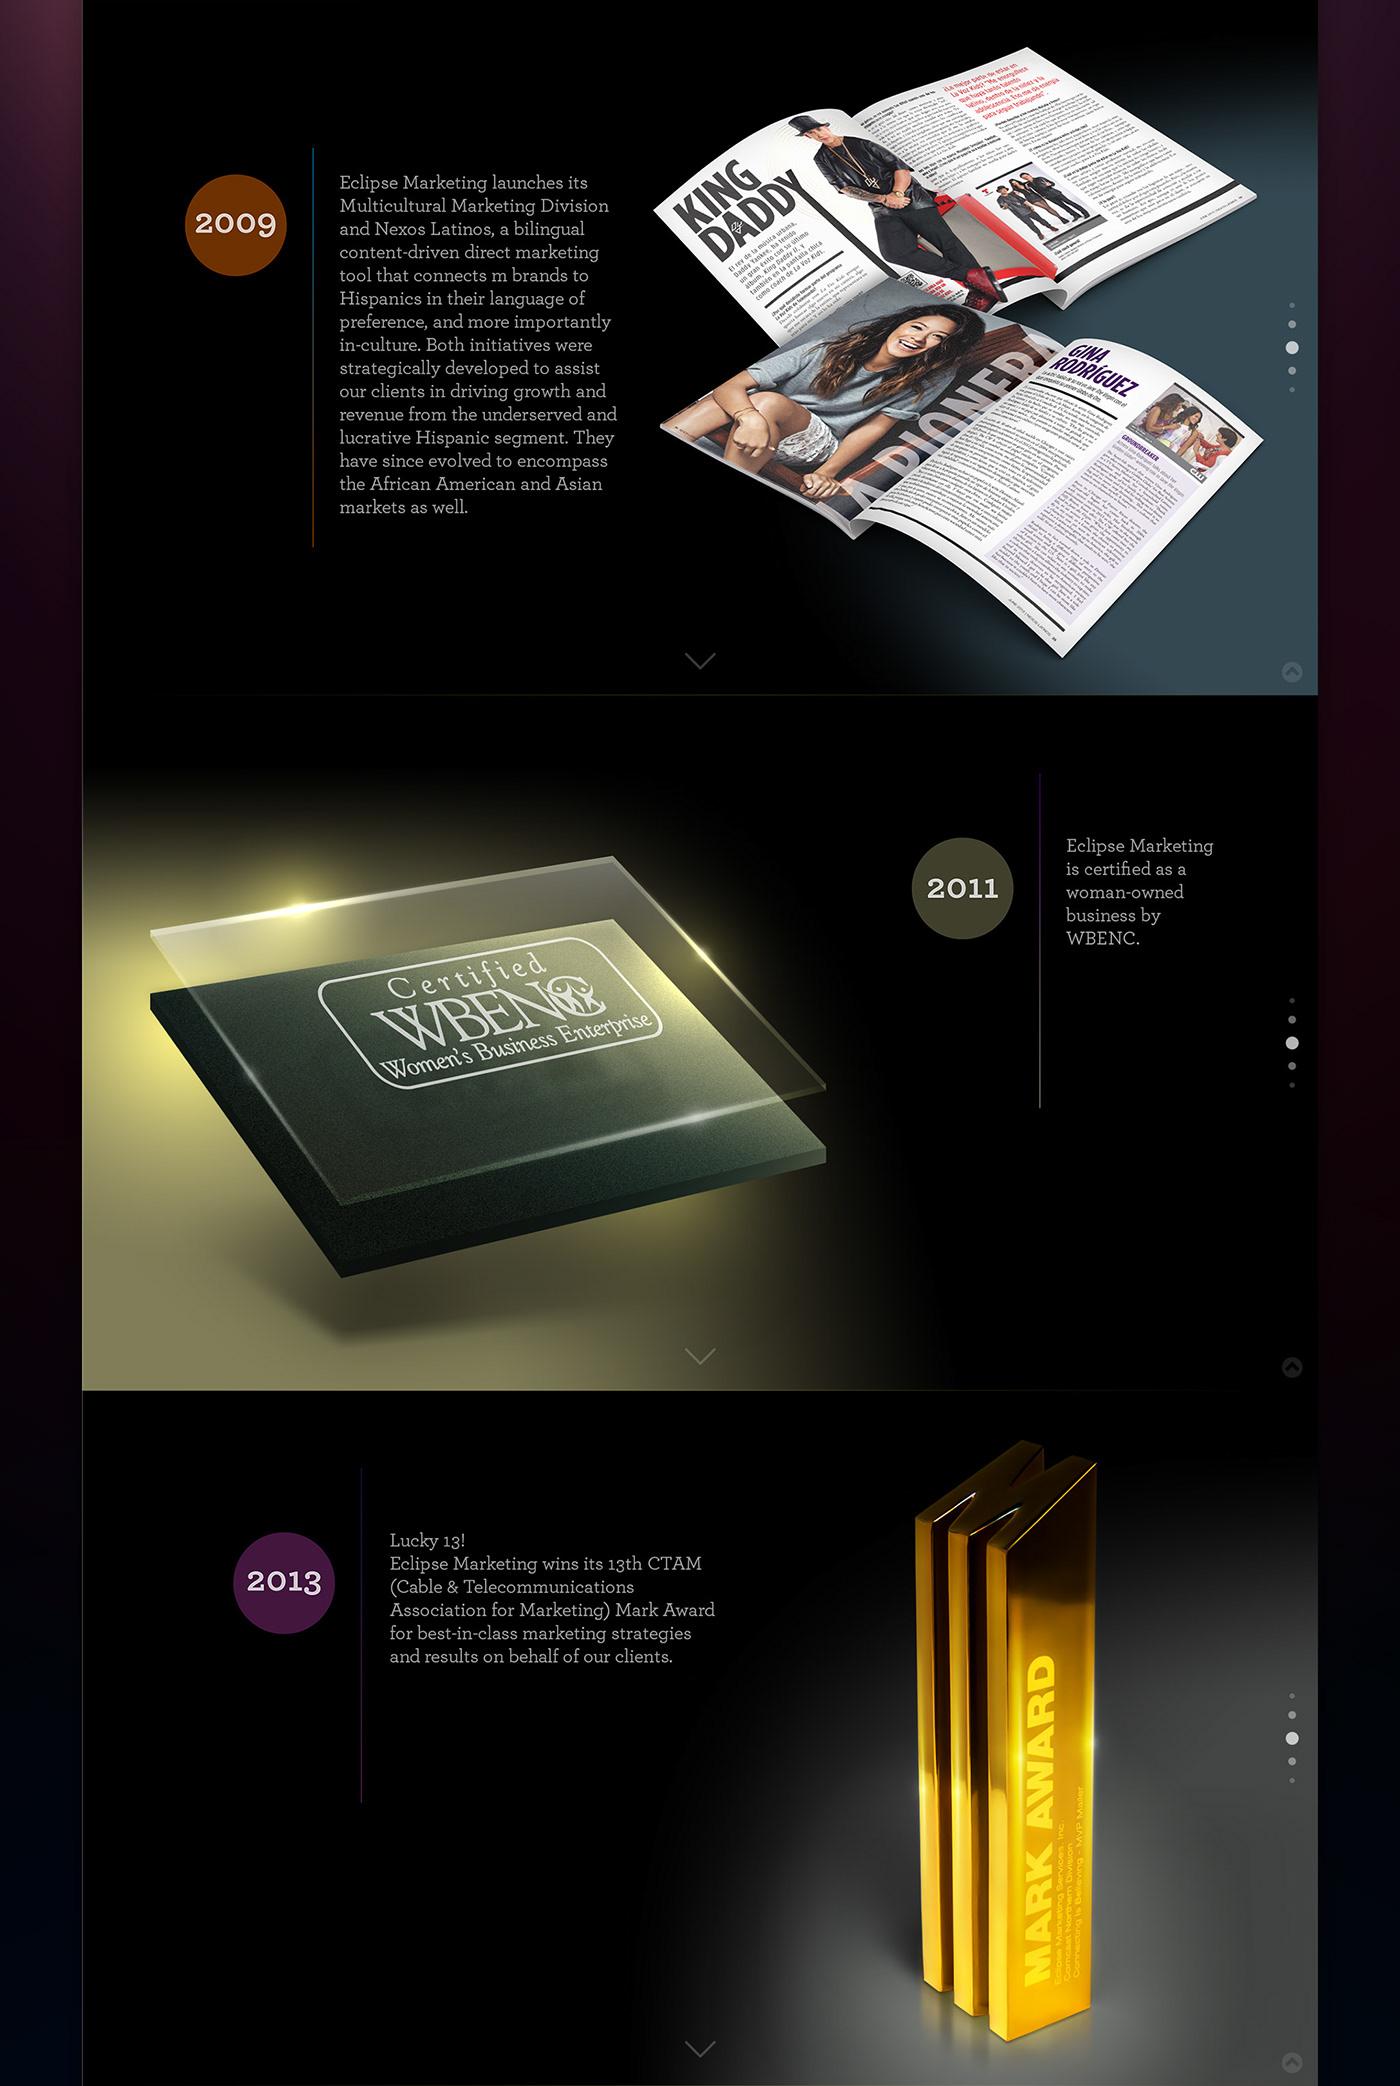 interactive timeline anniversary memory lane milestones visual parallax Responsive Website